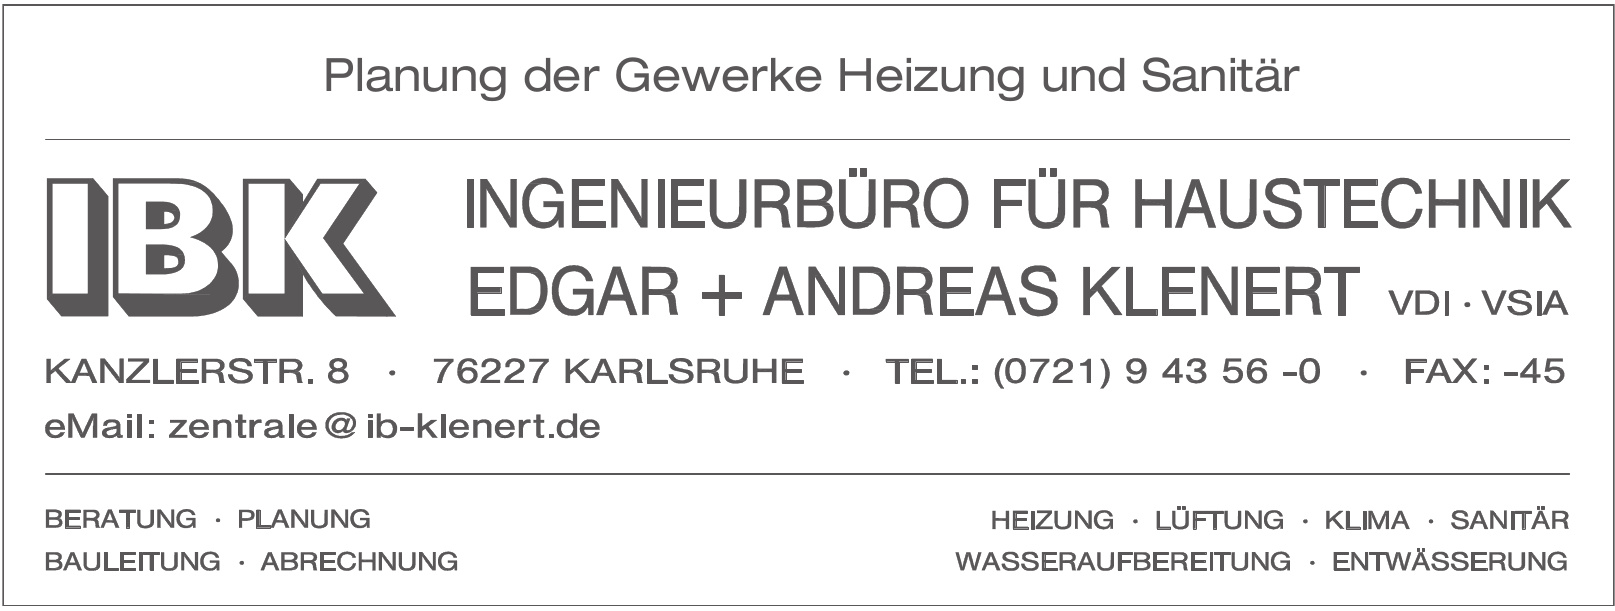 IBK Ingenieurbüro für Haustechnik Edgar + Andreas Klenert